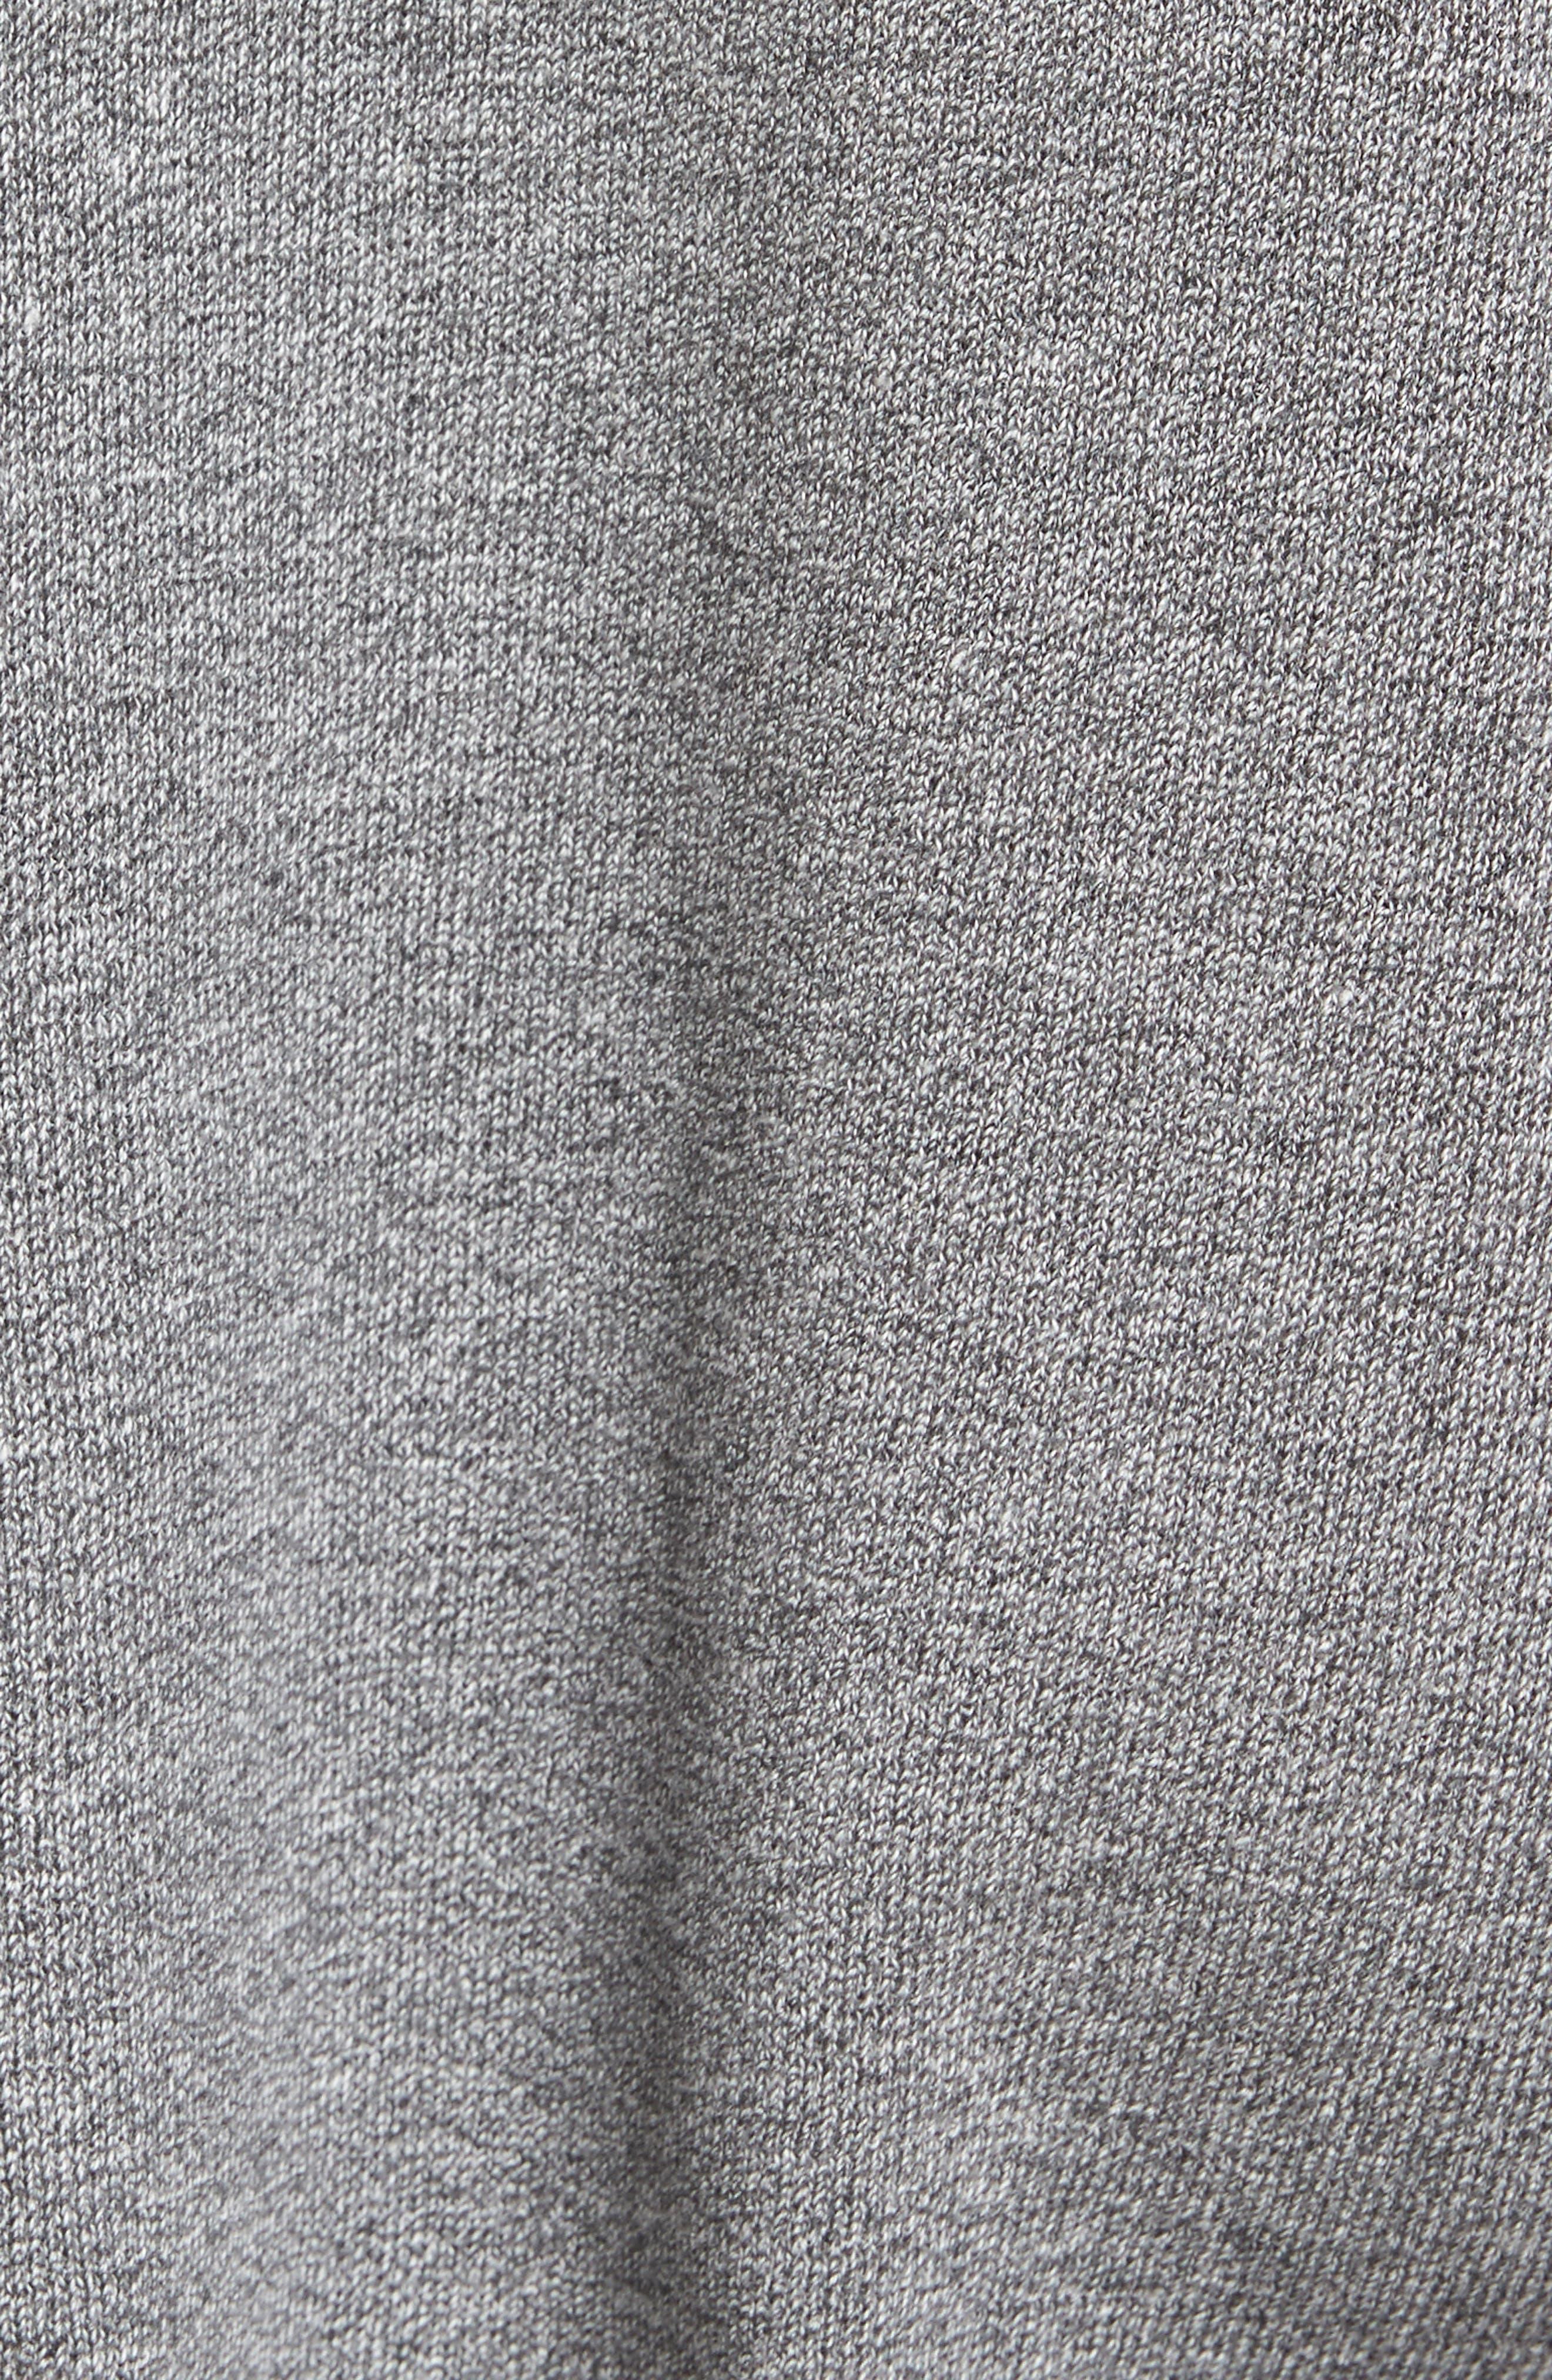 NFL Stitch of Liberty Embroidered Crewneck Sweatshirt,                             Alternate thumbnail 132, color,